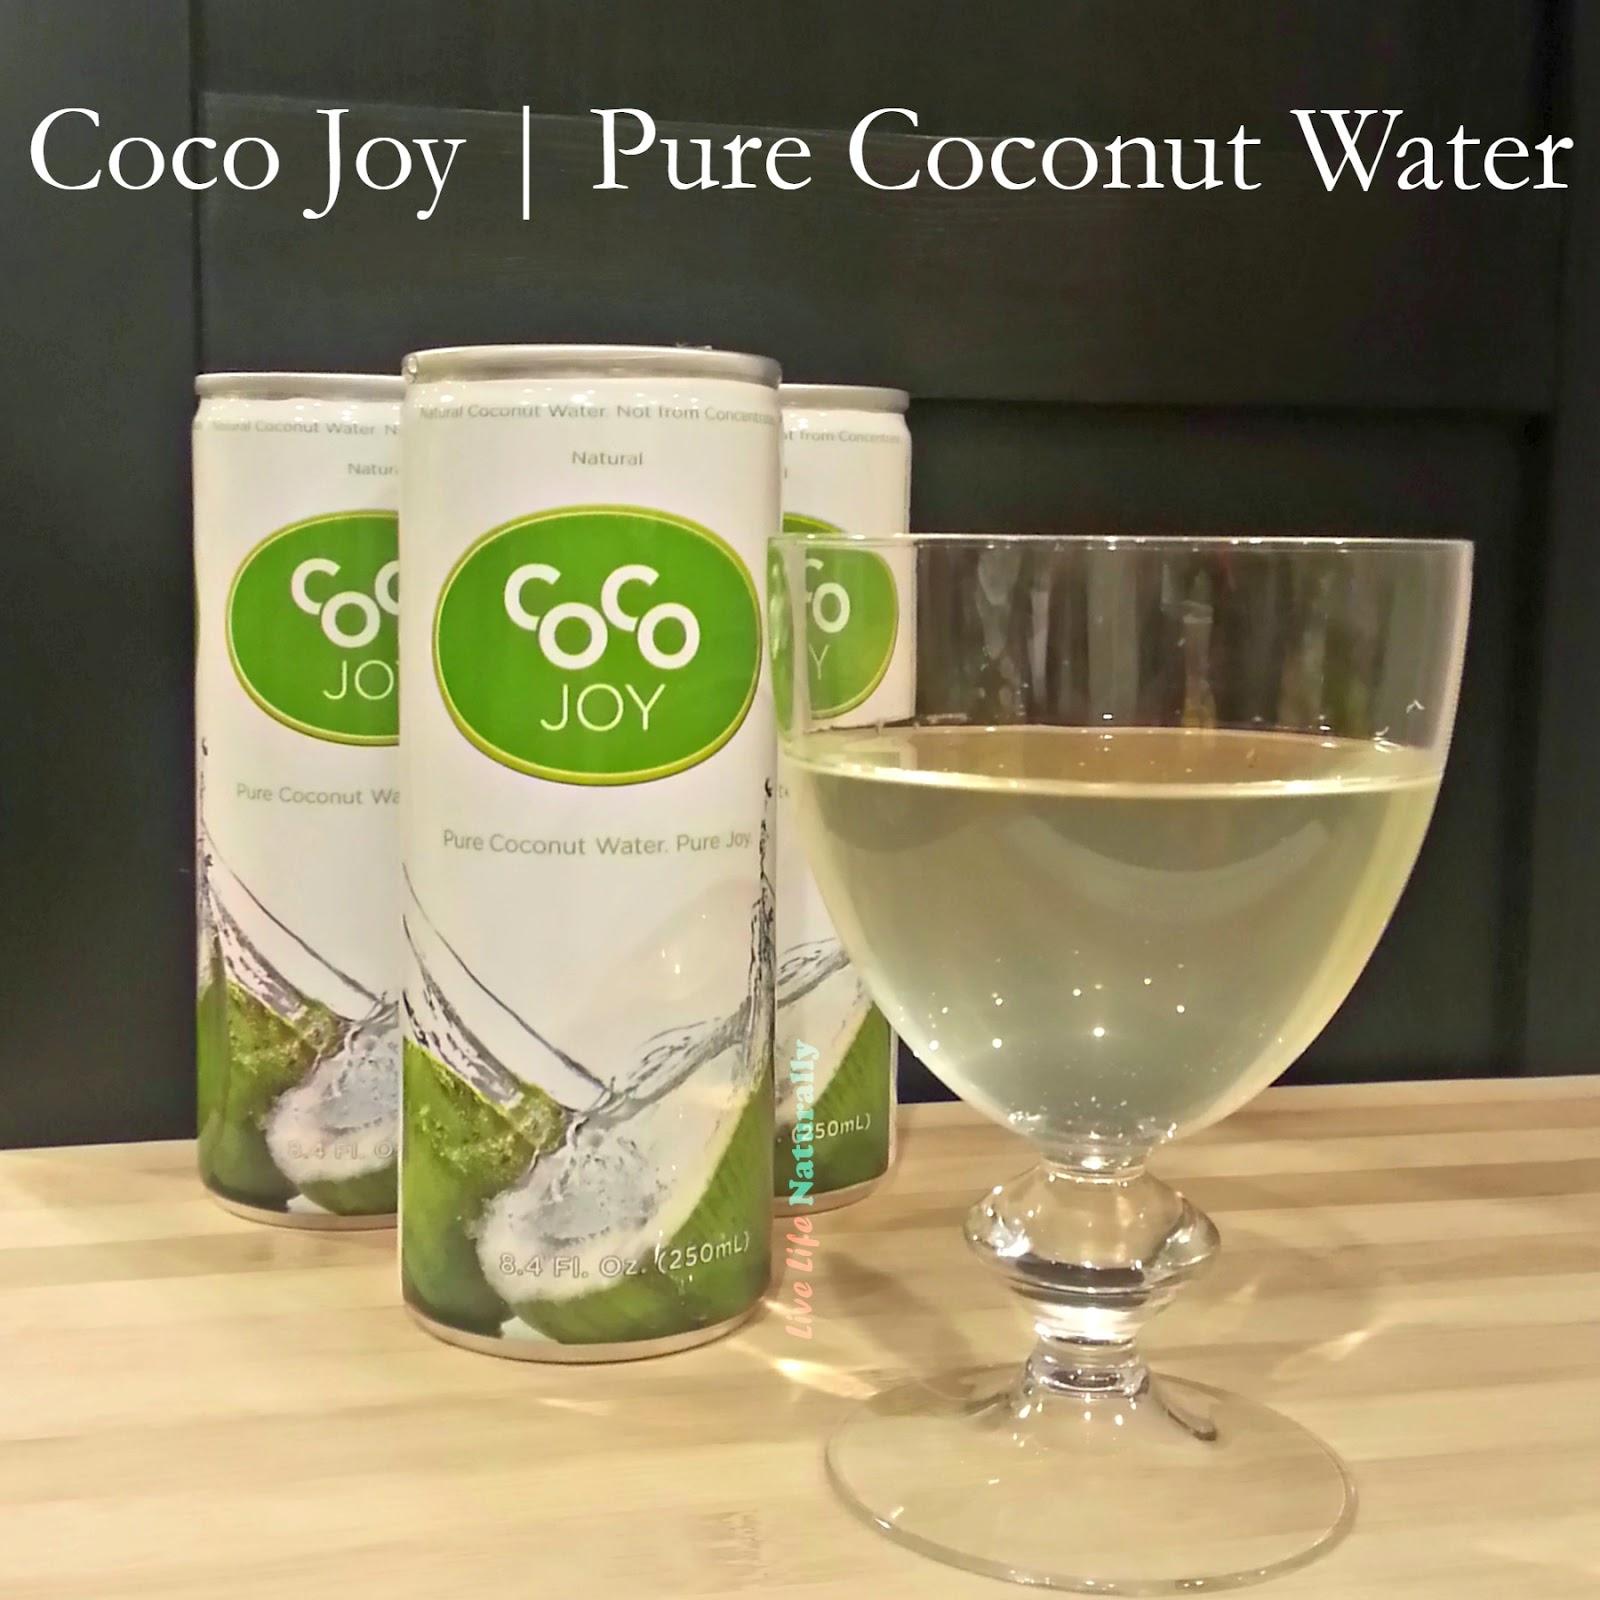 naked juice, best coconut water, coco joy